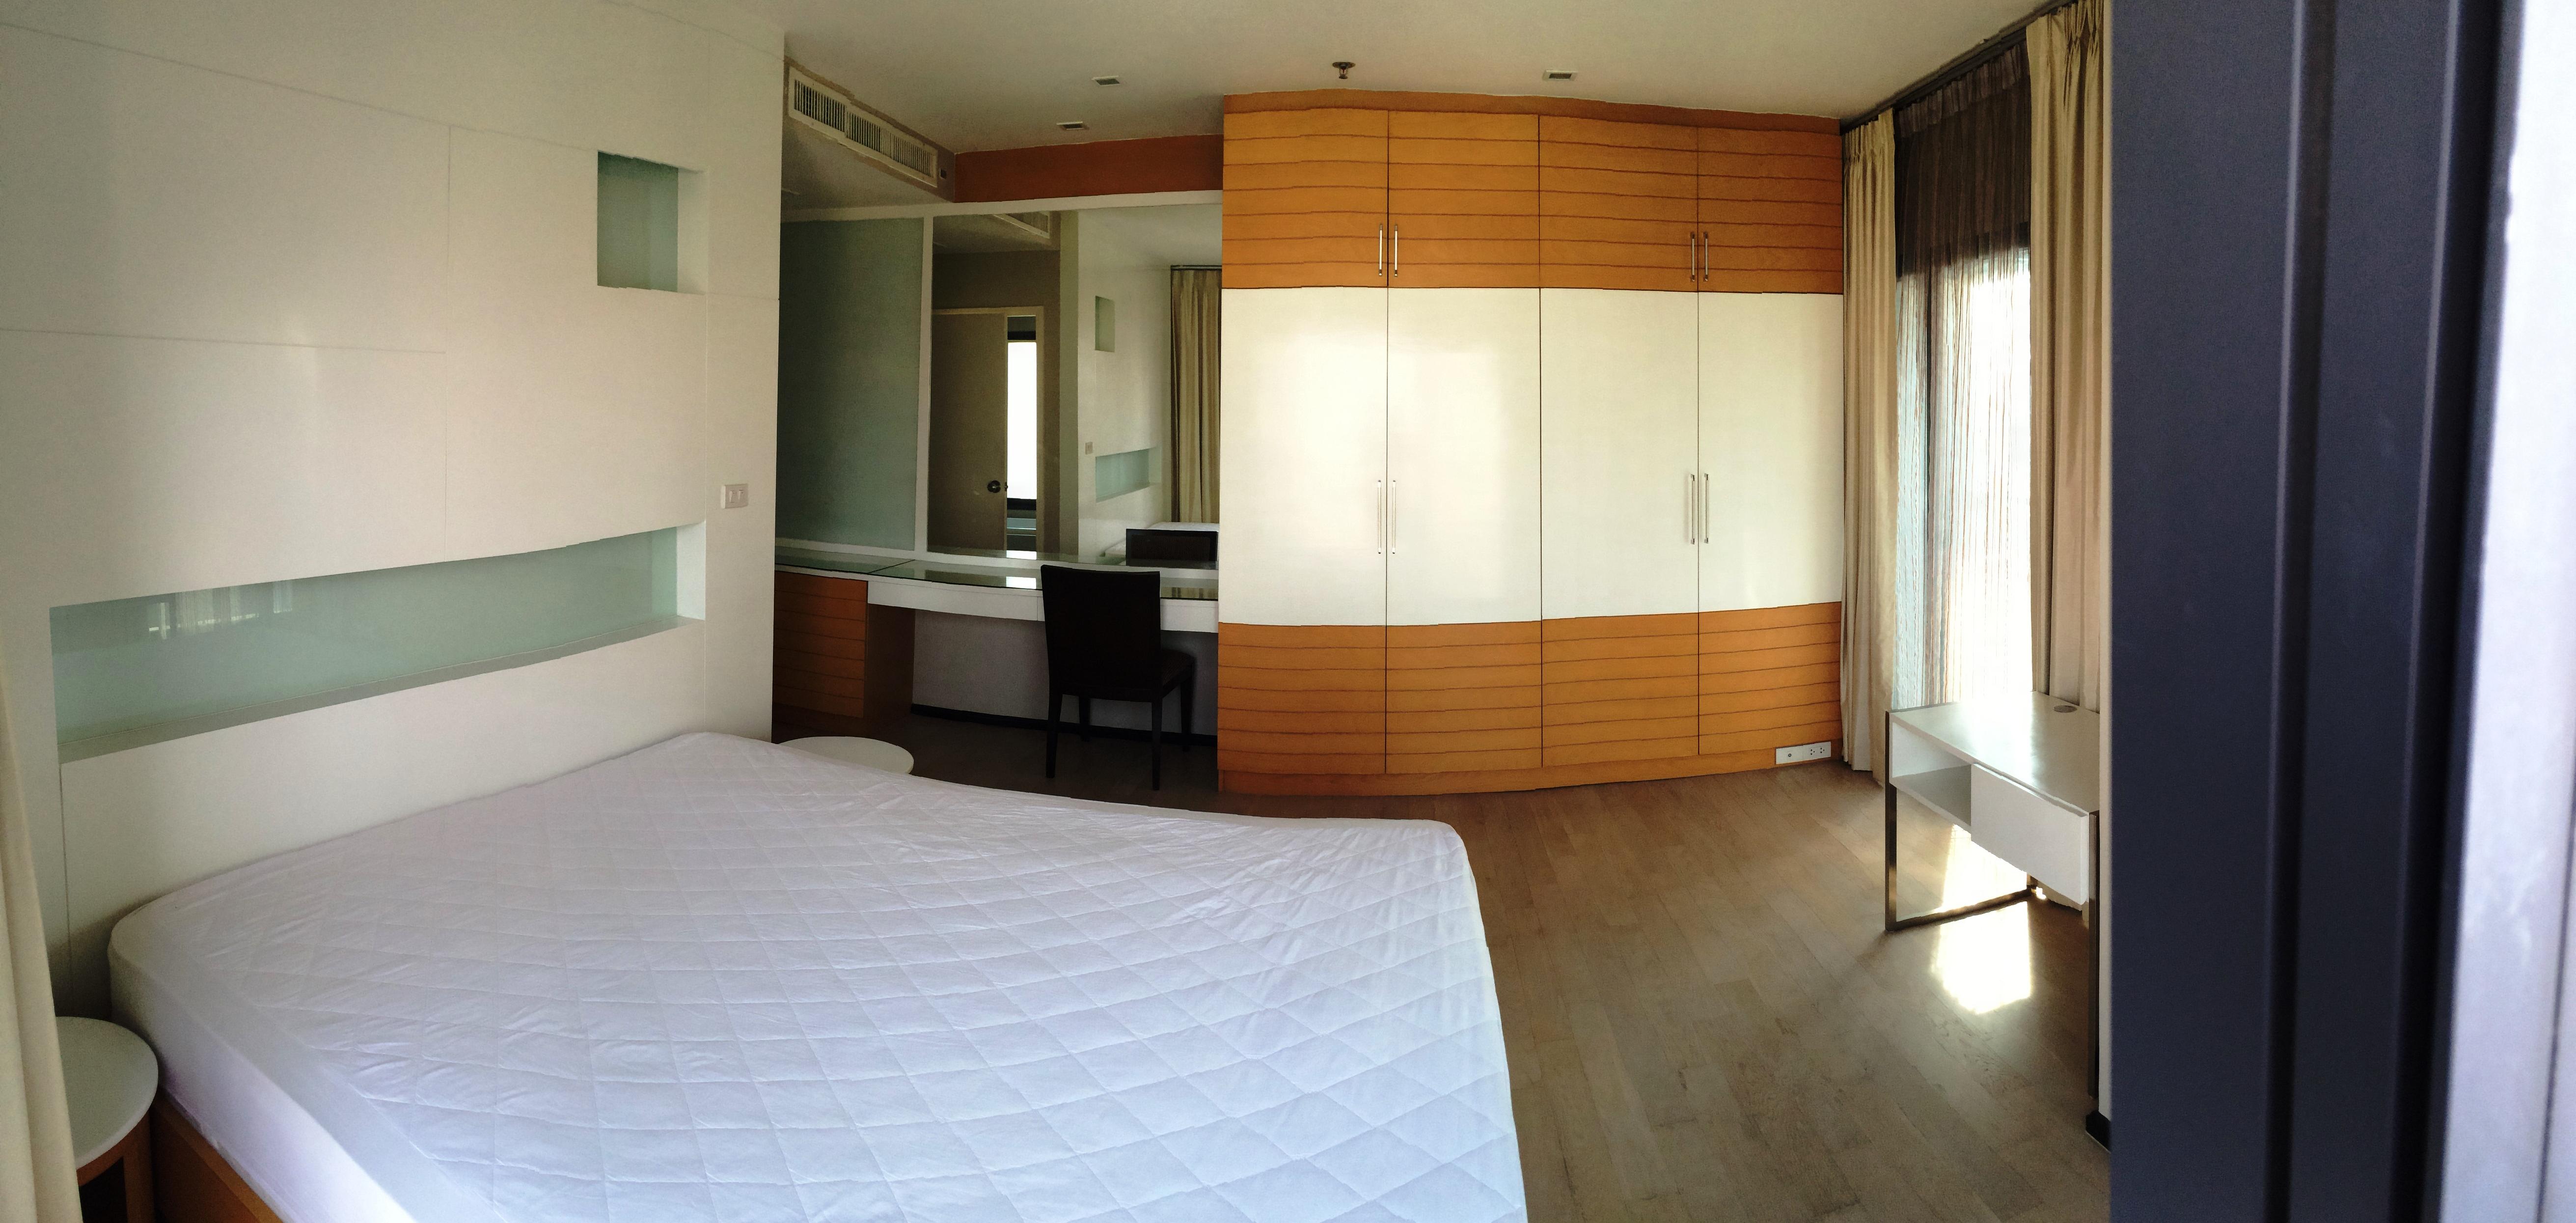 RE/MAX Properties Agency's Noble Remix, 2B/2B, High floor, BTS Thong Lo - sky walk access 9